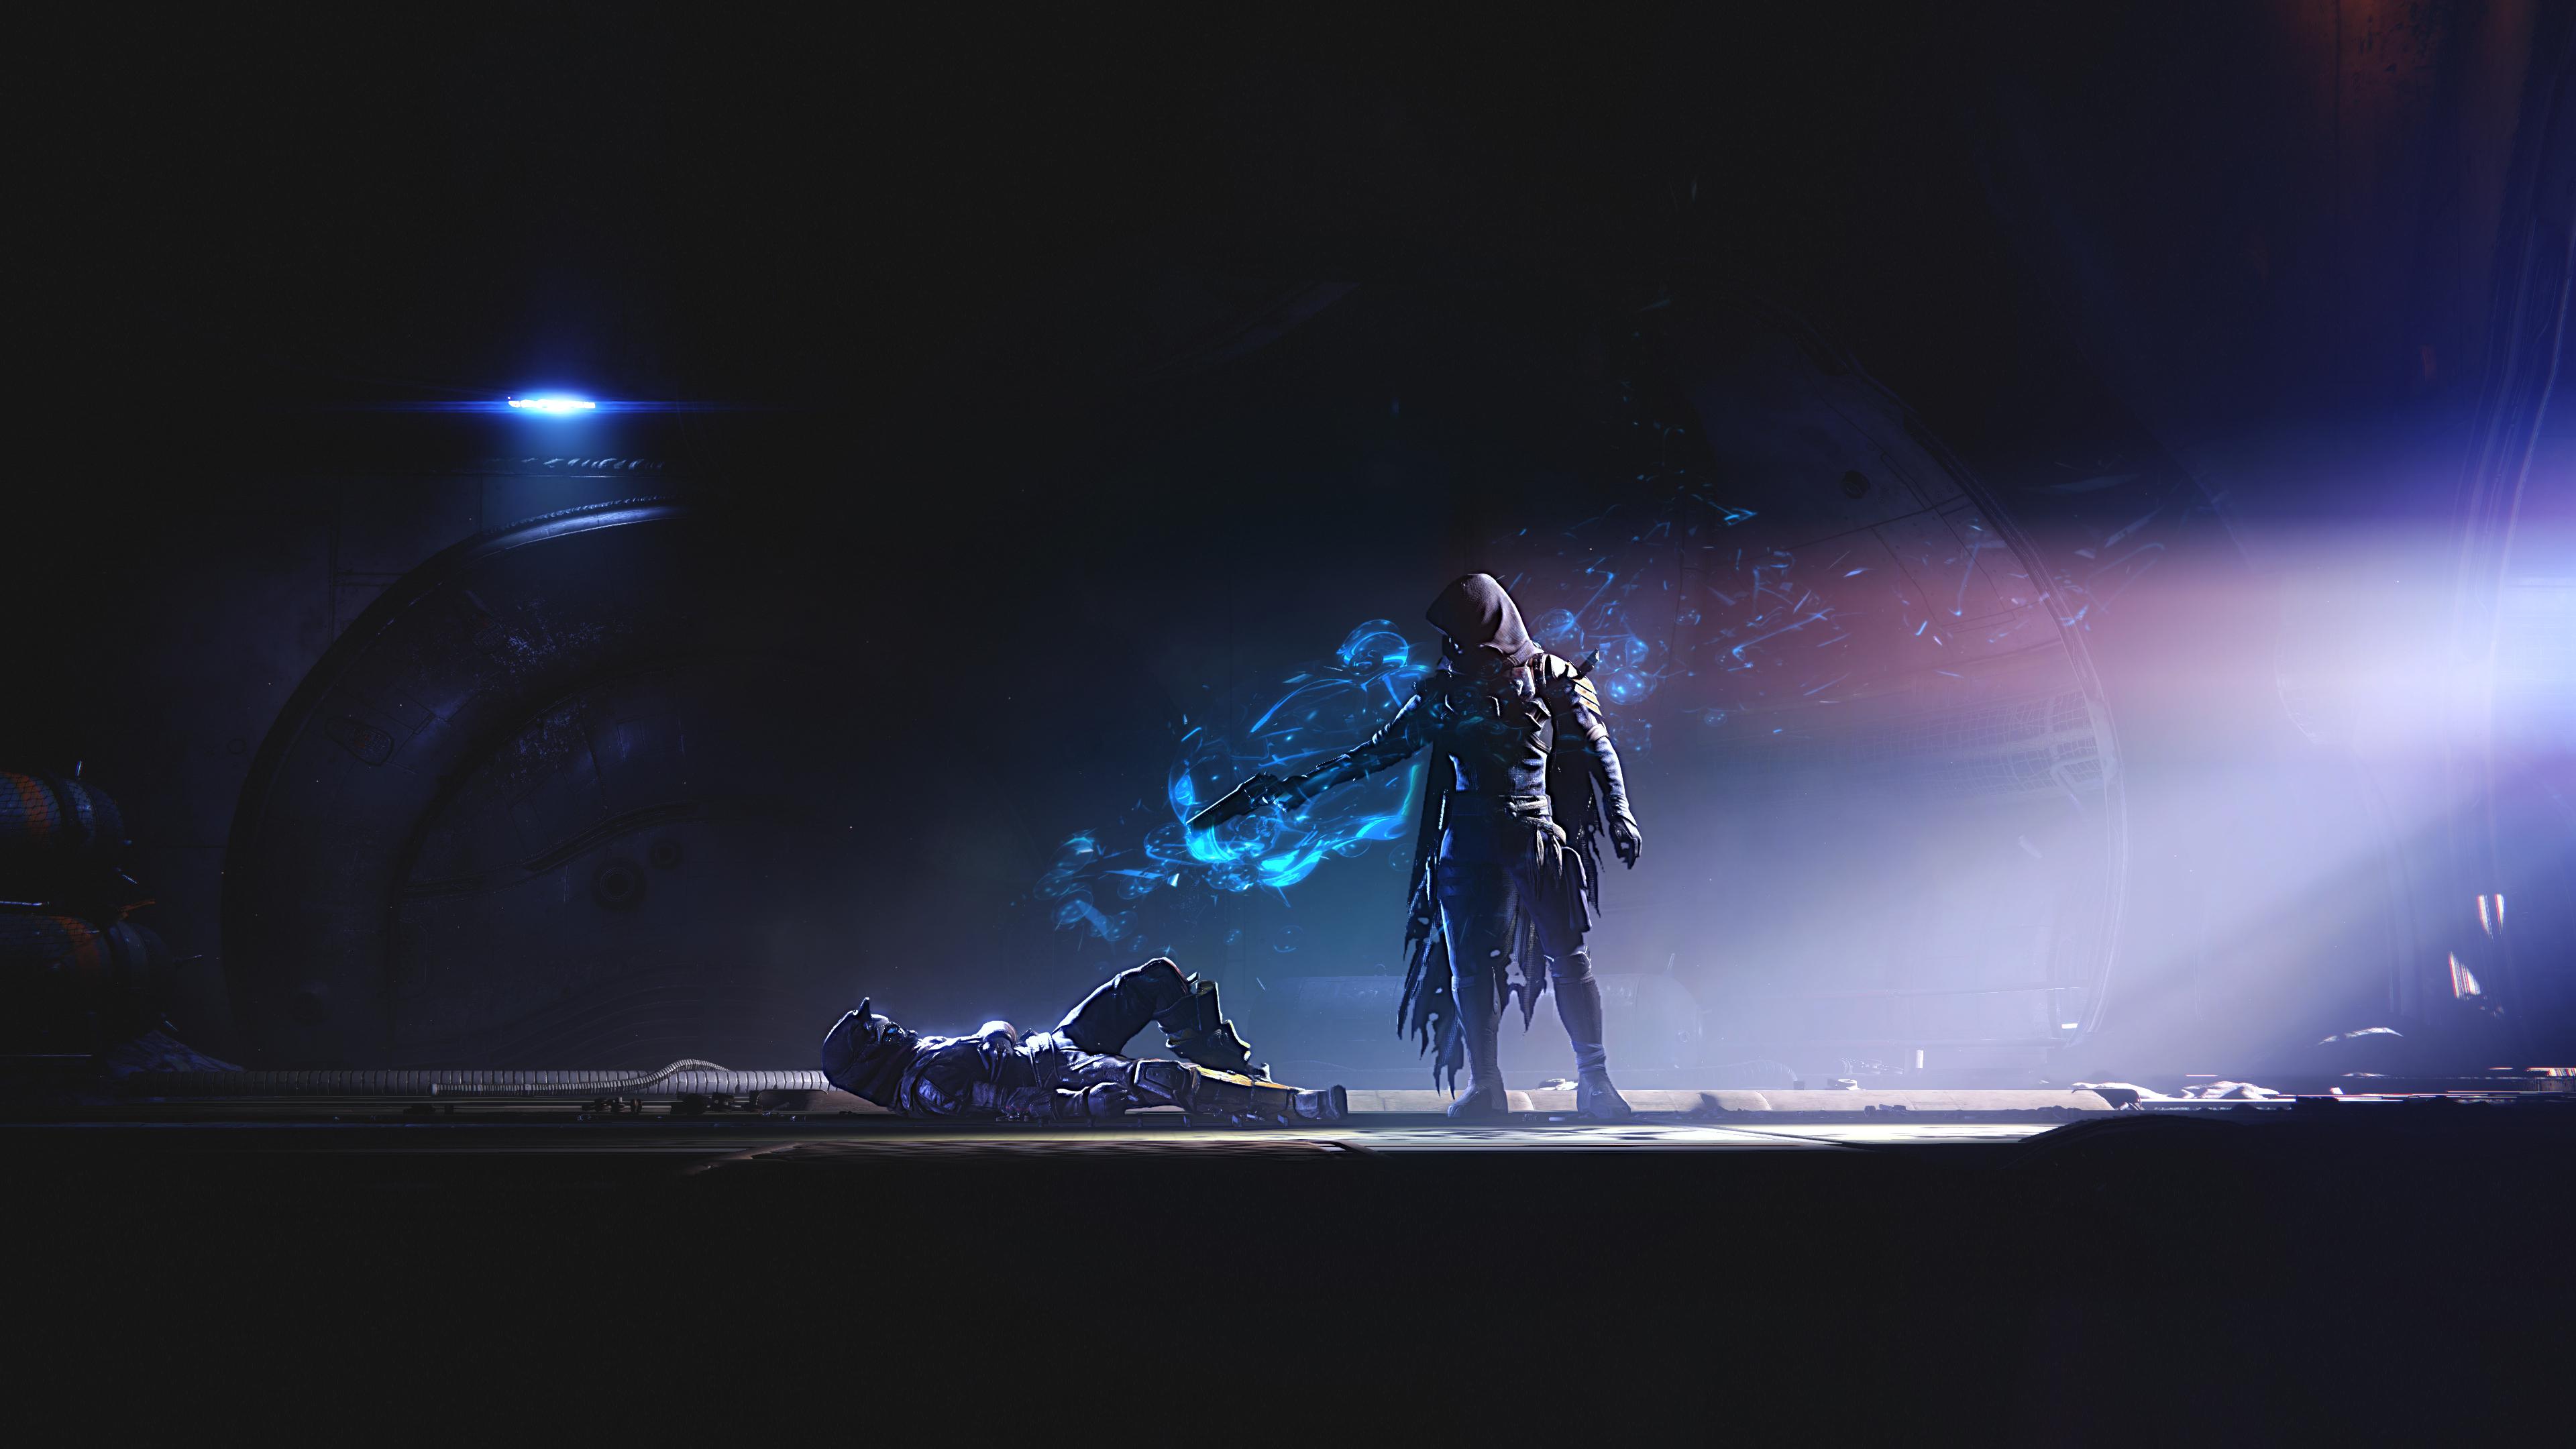 Destiny 2 Cayde 6 Death 4k Wallpaper Syanart Station